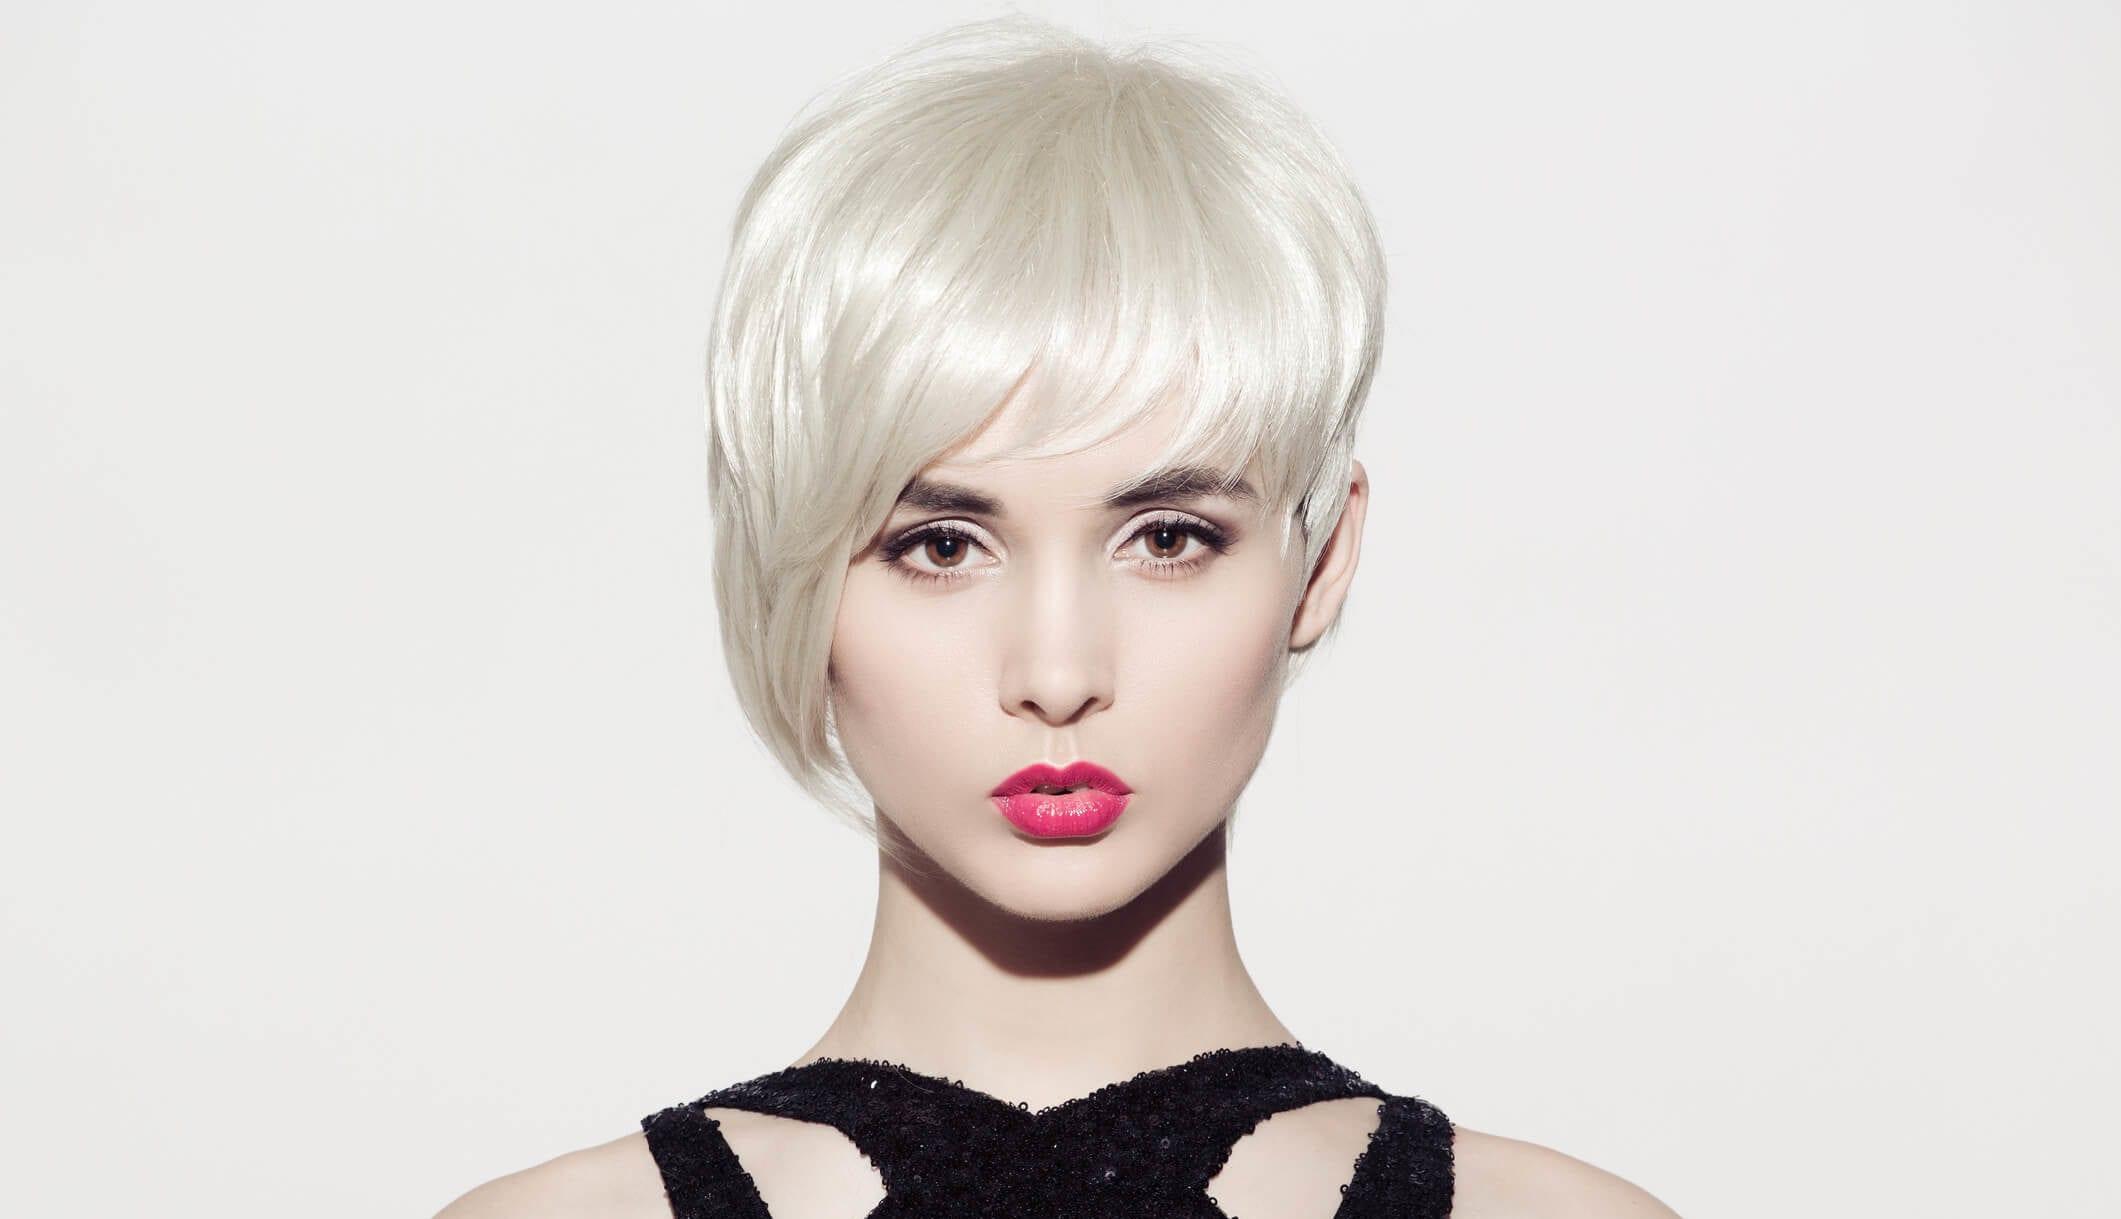 pelo rubio blanco